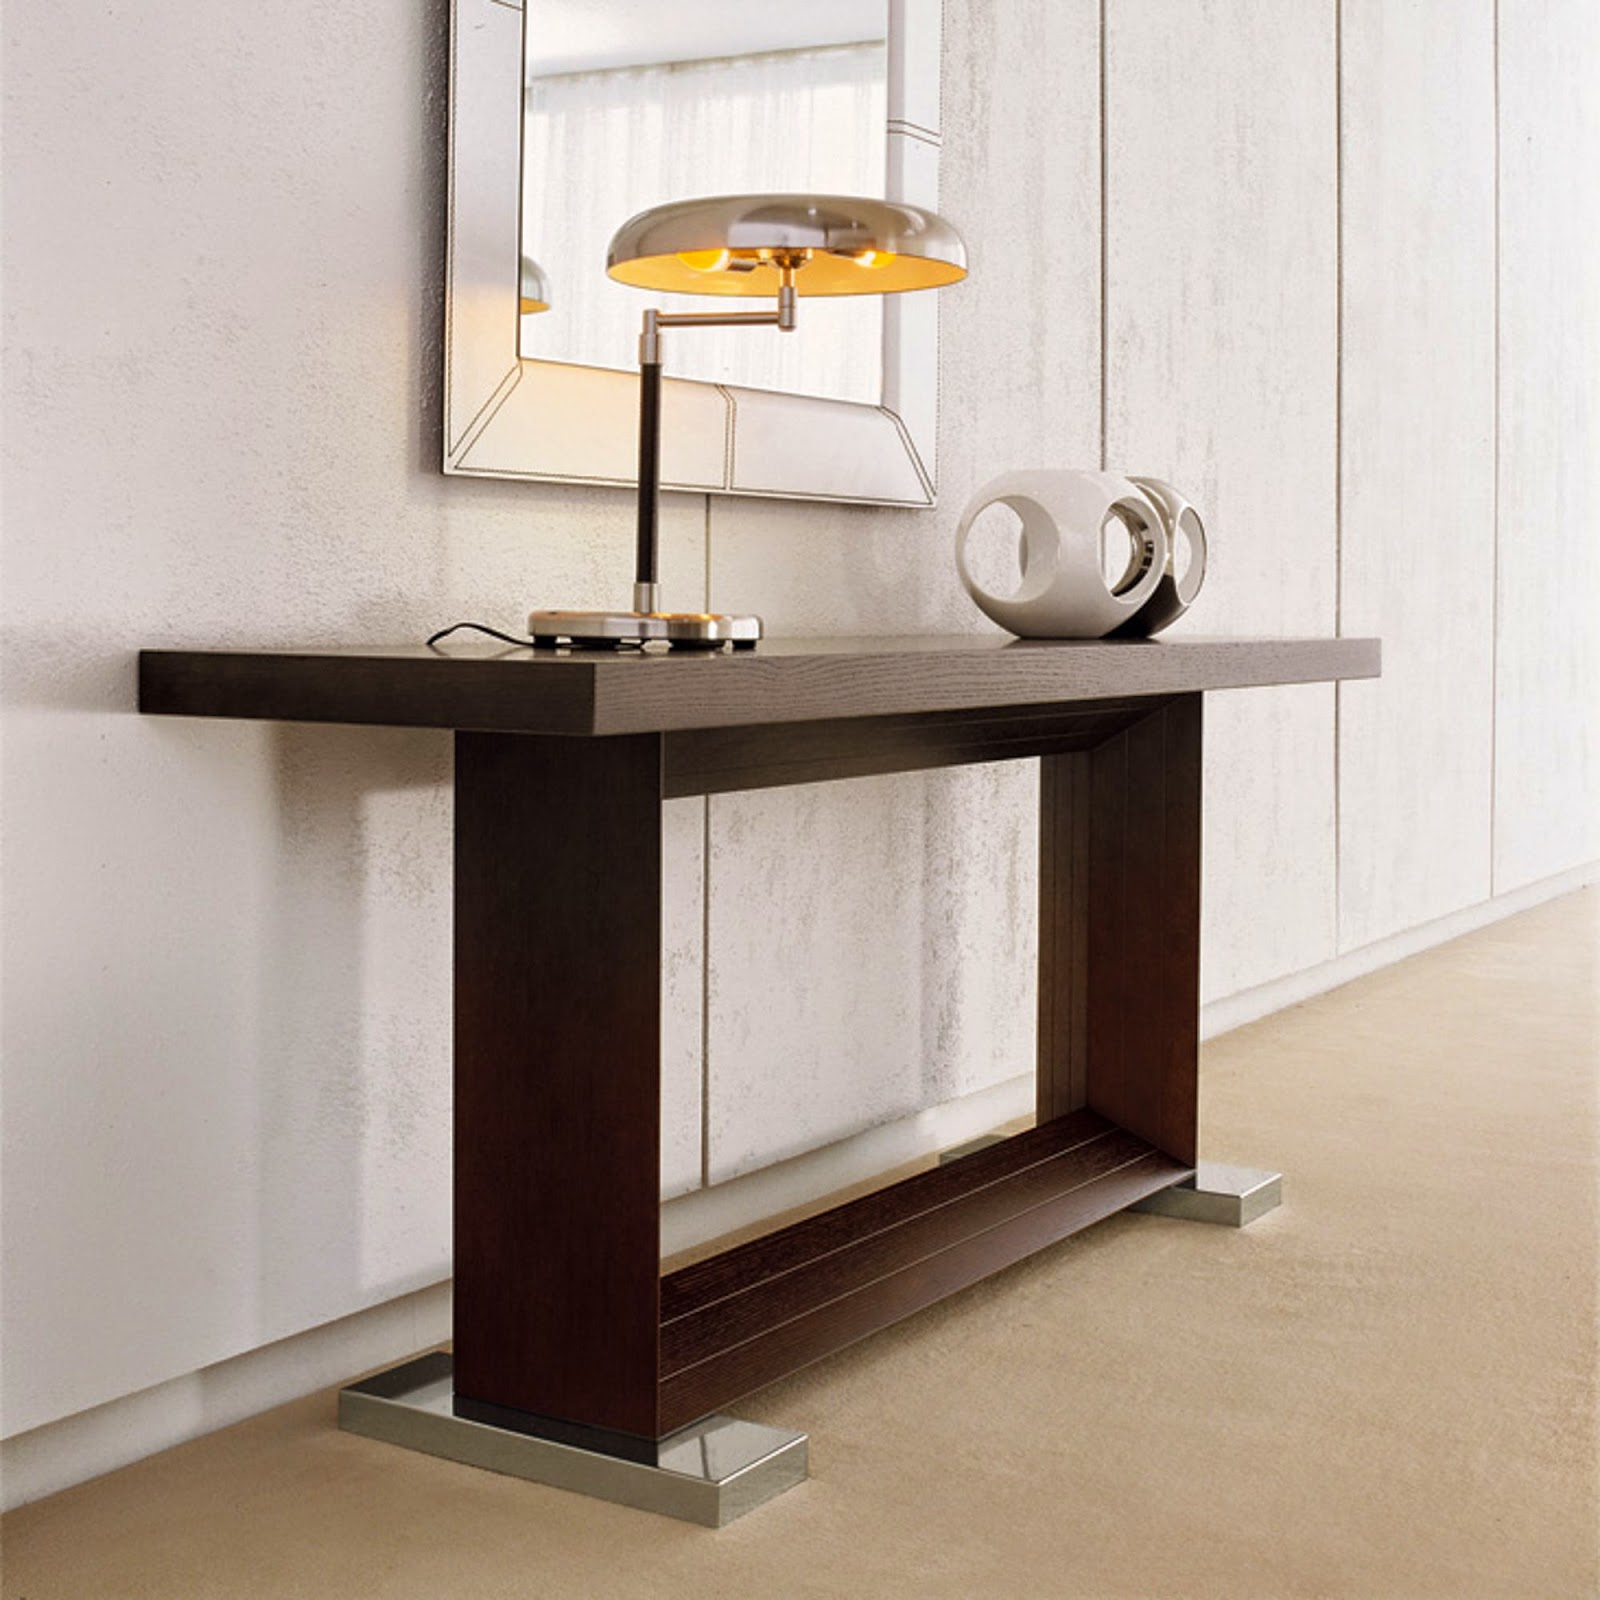 Console table   Monaco   Cattelan Italia   Italian Furniture. Monaco Dining Table Cattelan Italia. Home Design Ideas